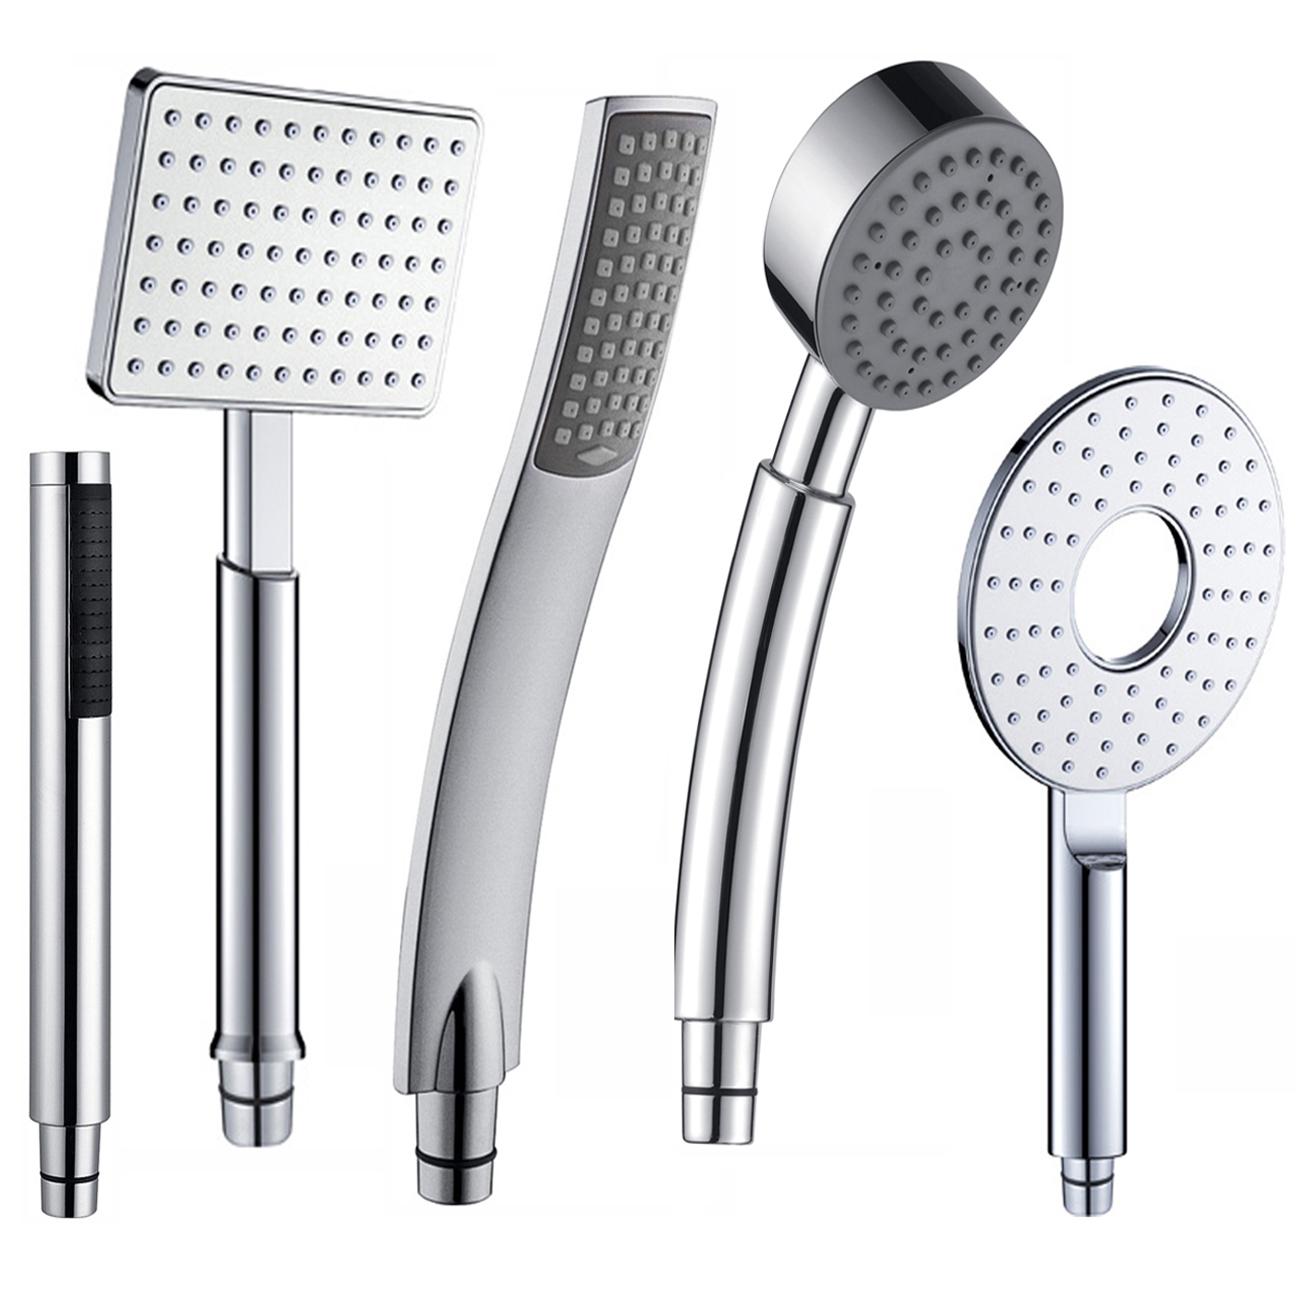 chrome hand held thermostatic mixer shower head hose ebay. Black Bedroom Furniture Sets. Home Design Ideas